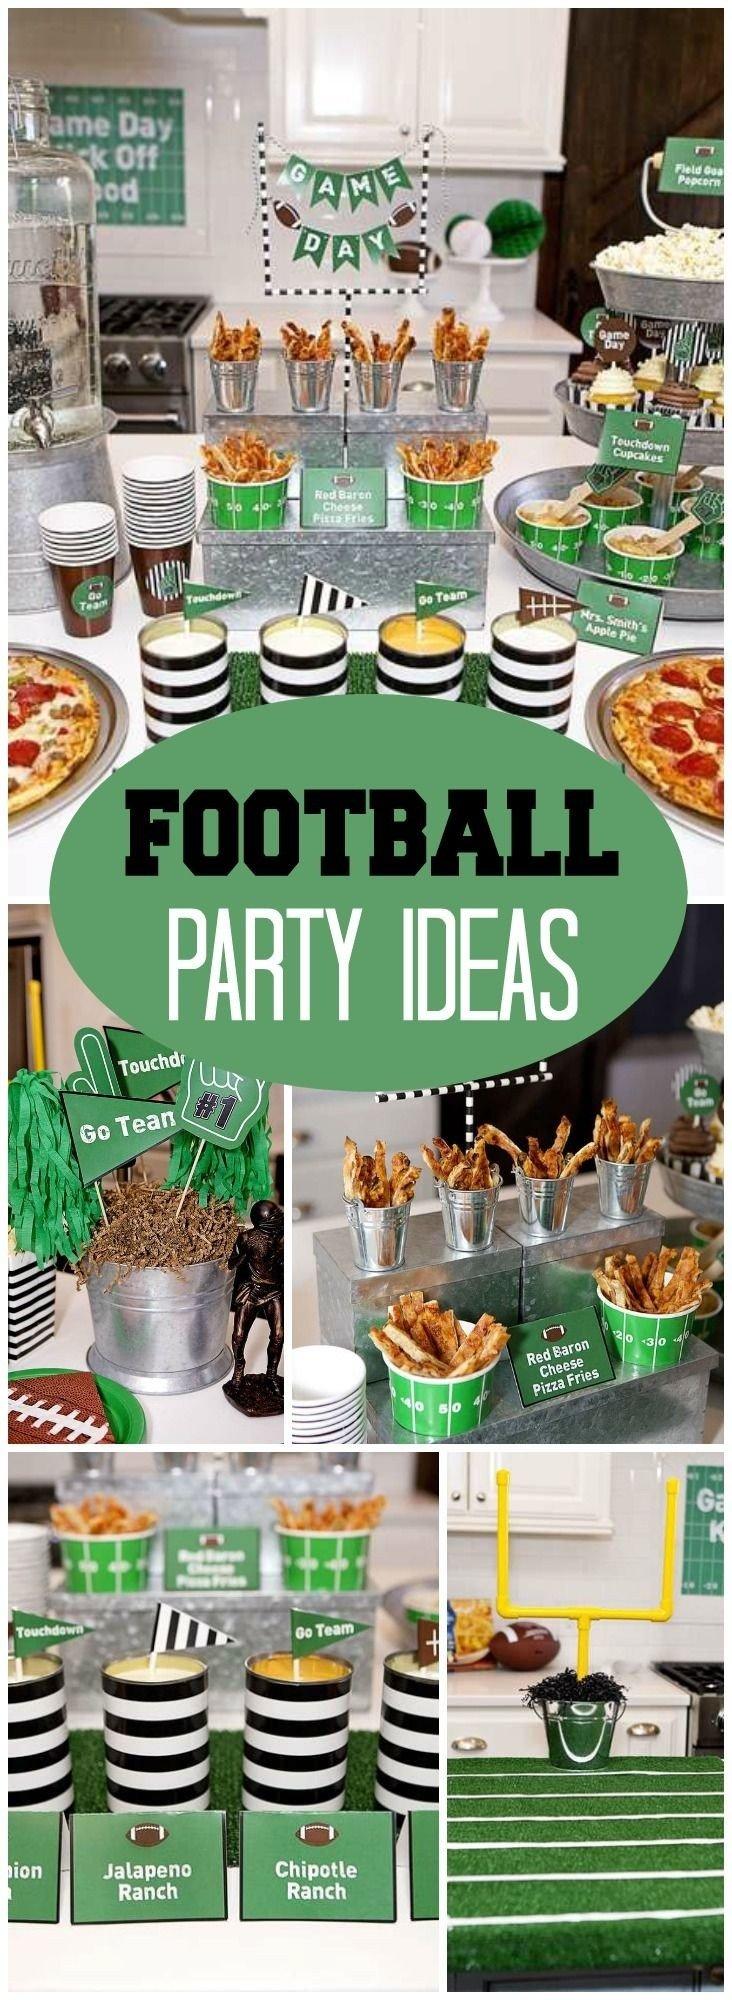 10 Gorgeous Super Bowl Party Ideas Pinterest 318 best football party ideas images on pinterest inspiration of 2020